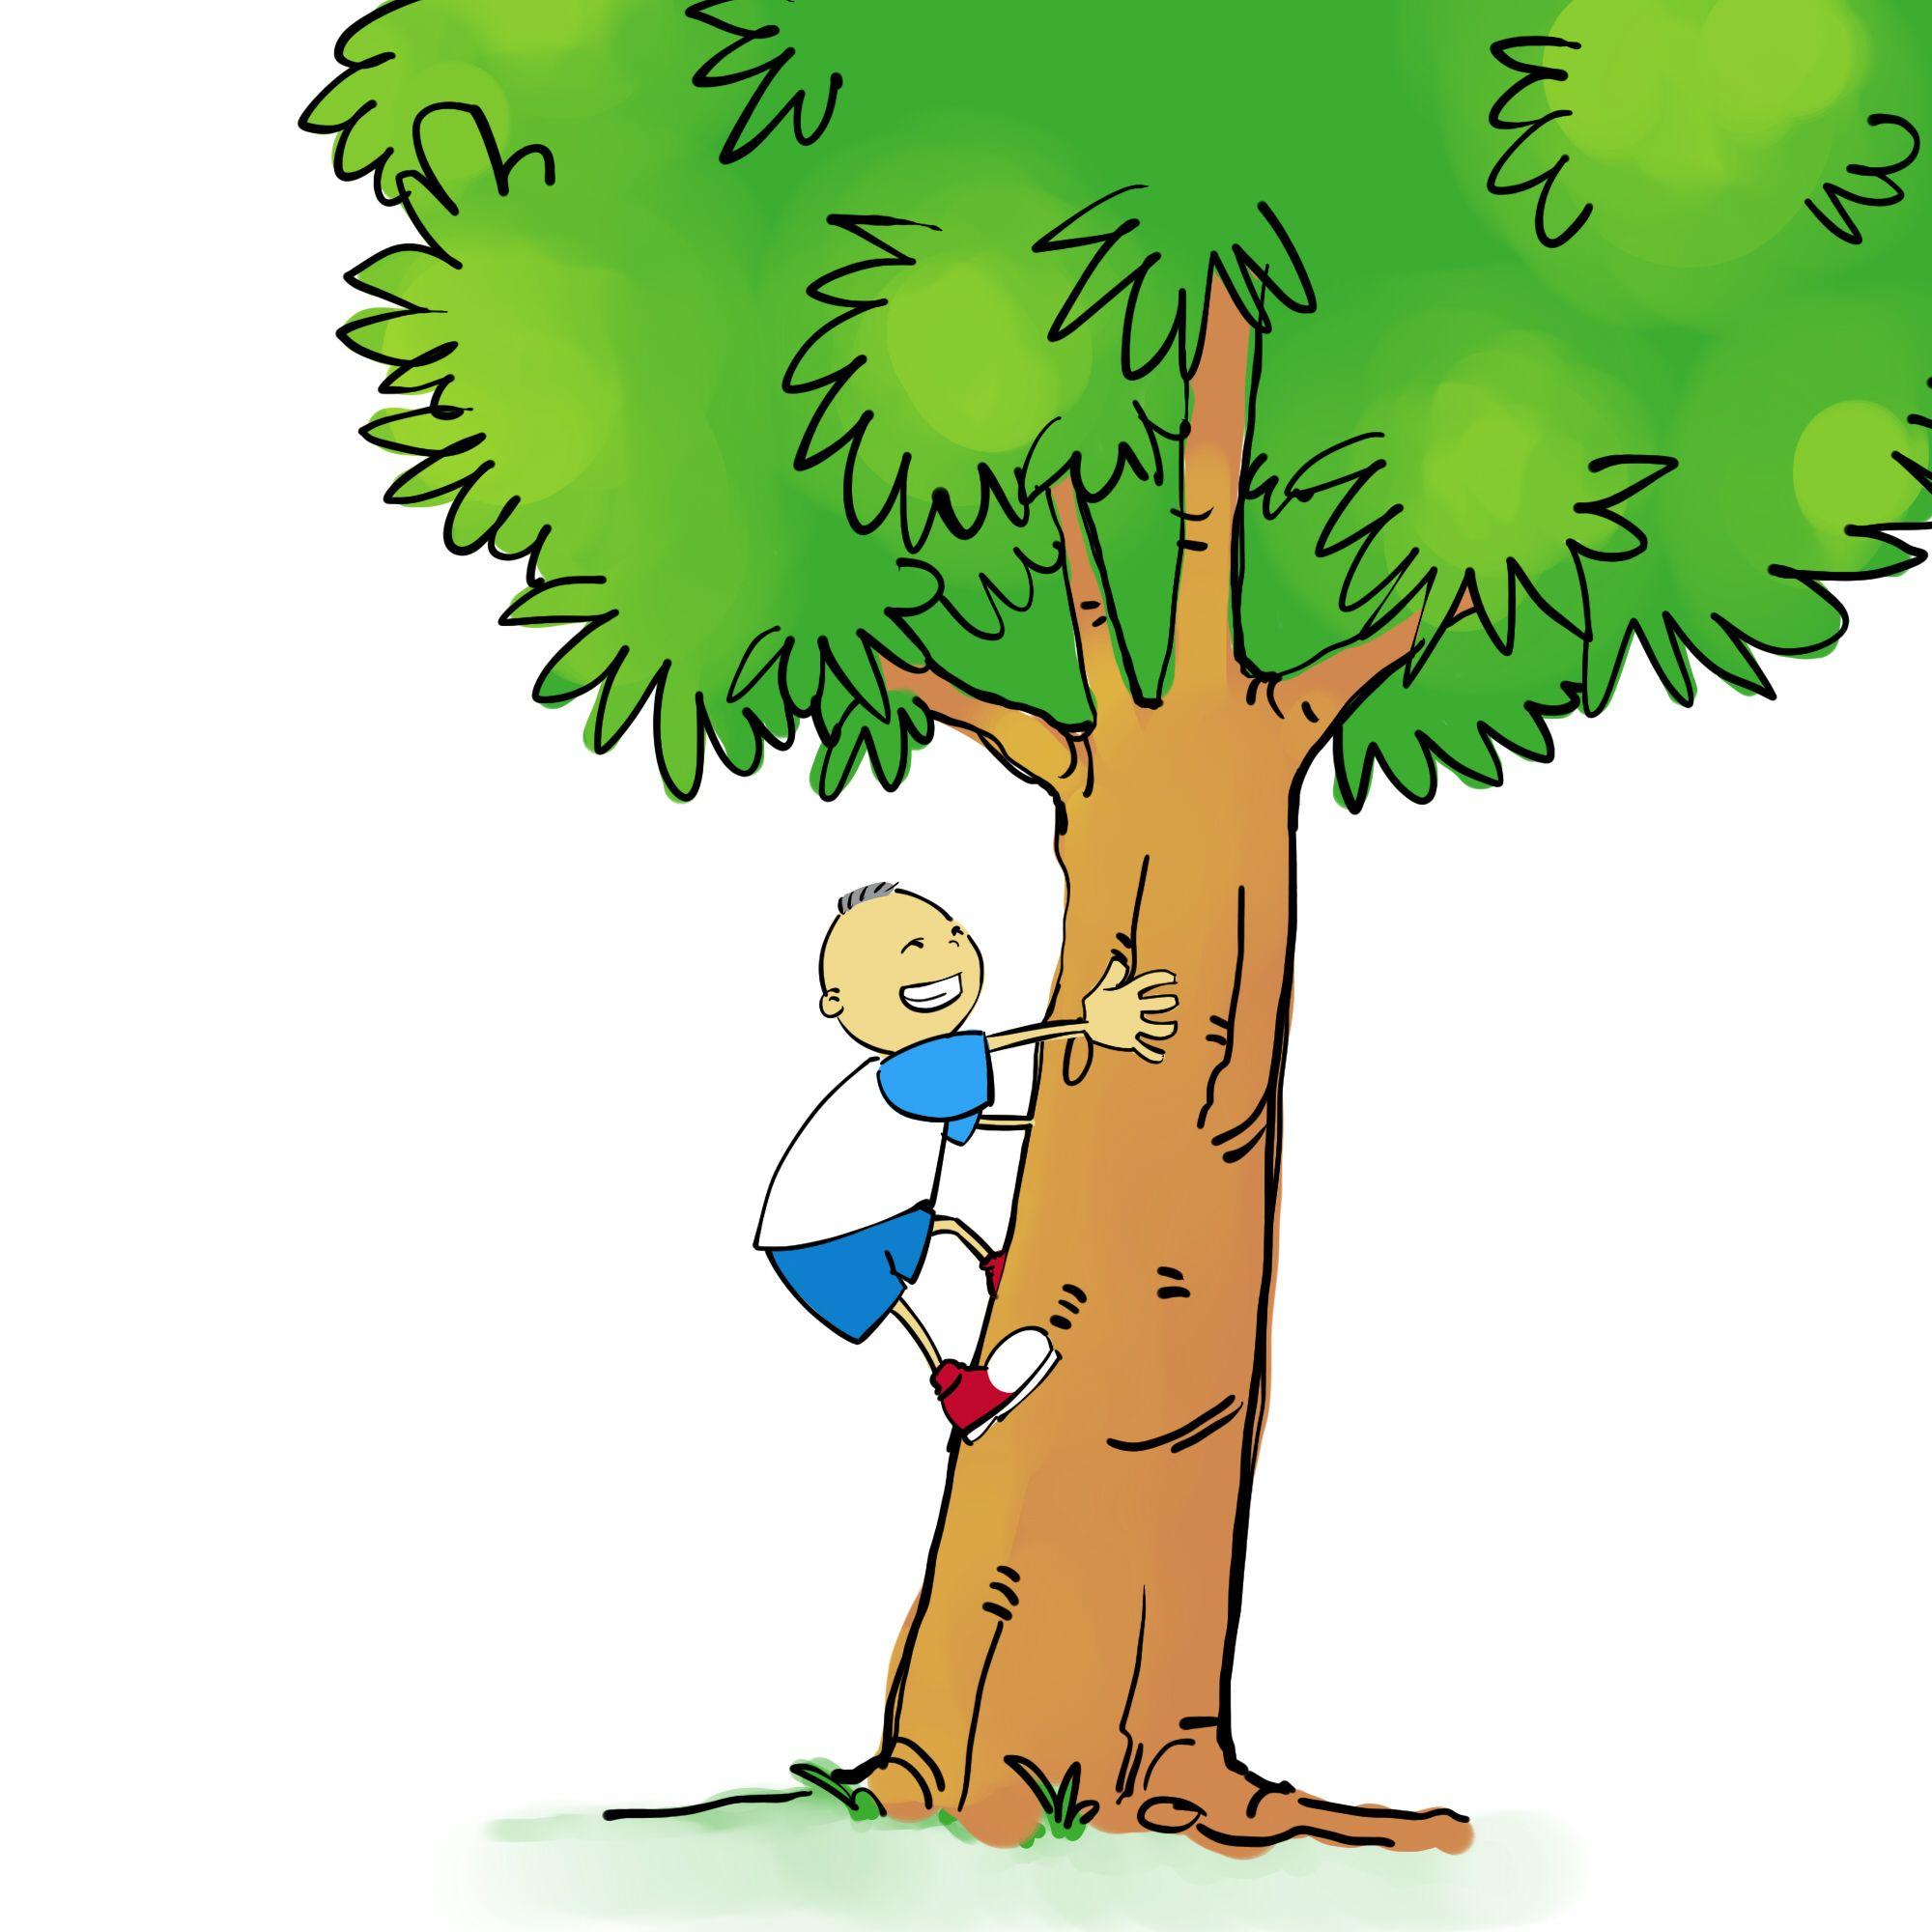 Pin by Erika Van Zyl on Do not climb tree.